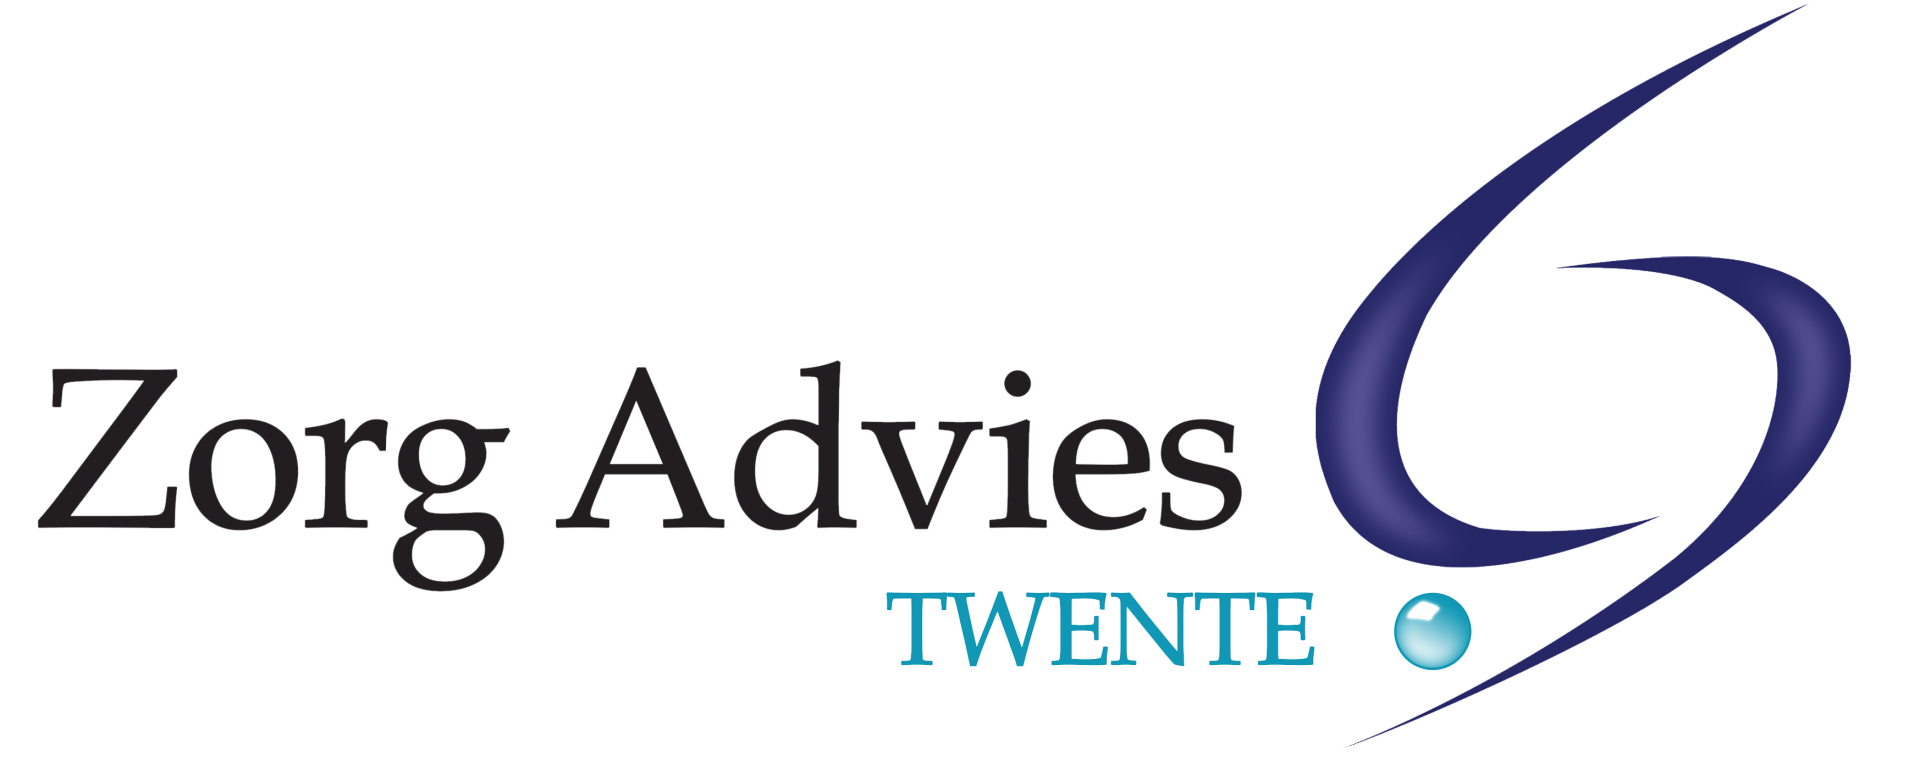 Zorg Advies Twente